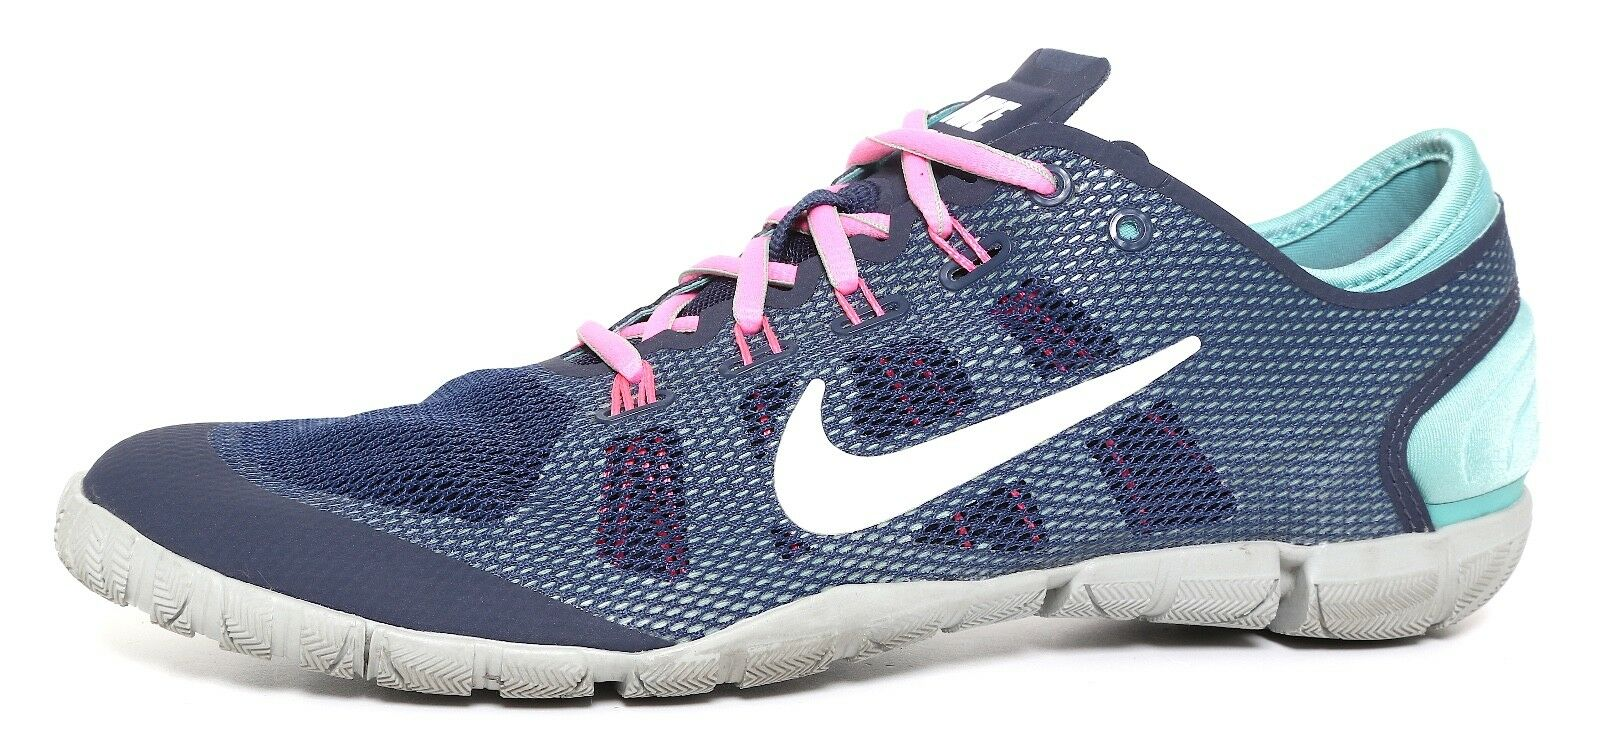 Nike Flat Flexible Women Running Sneakers Turquoise Grey Women Flexible Sz 9 2365 ed308d